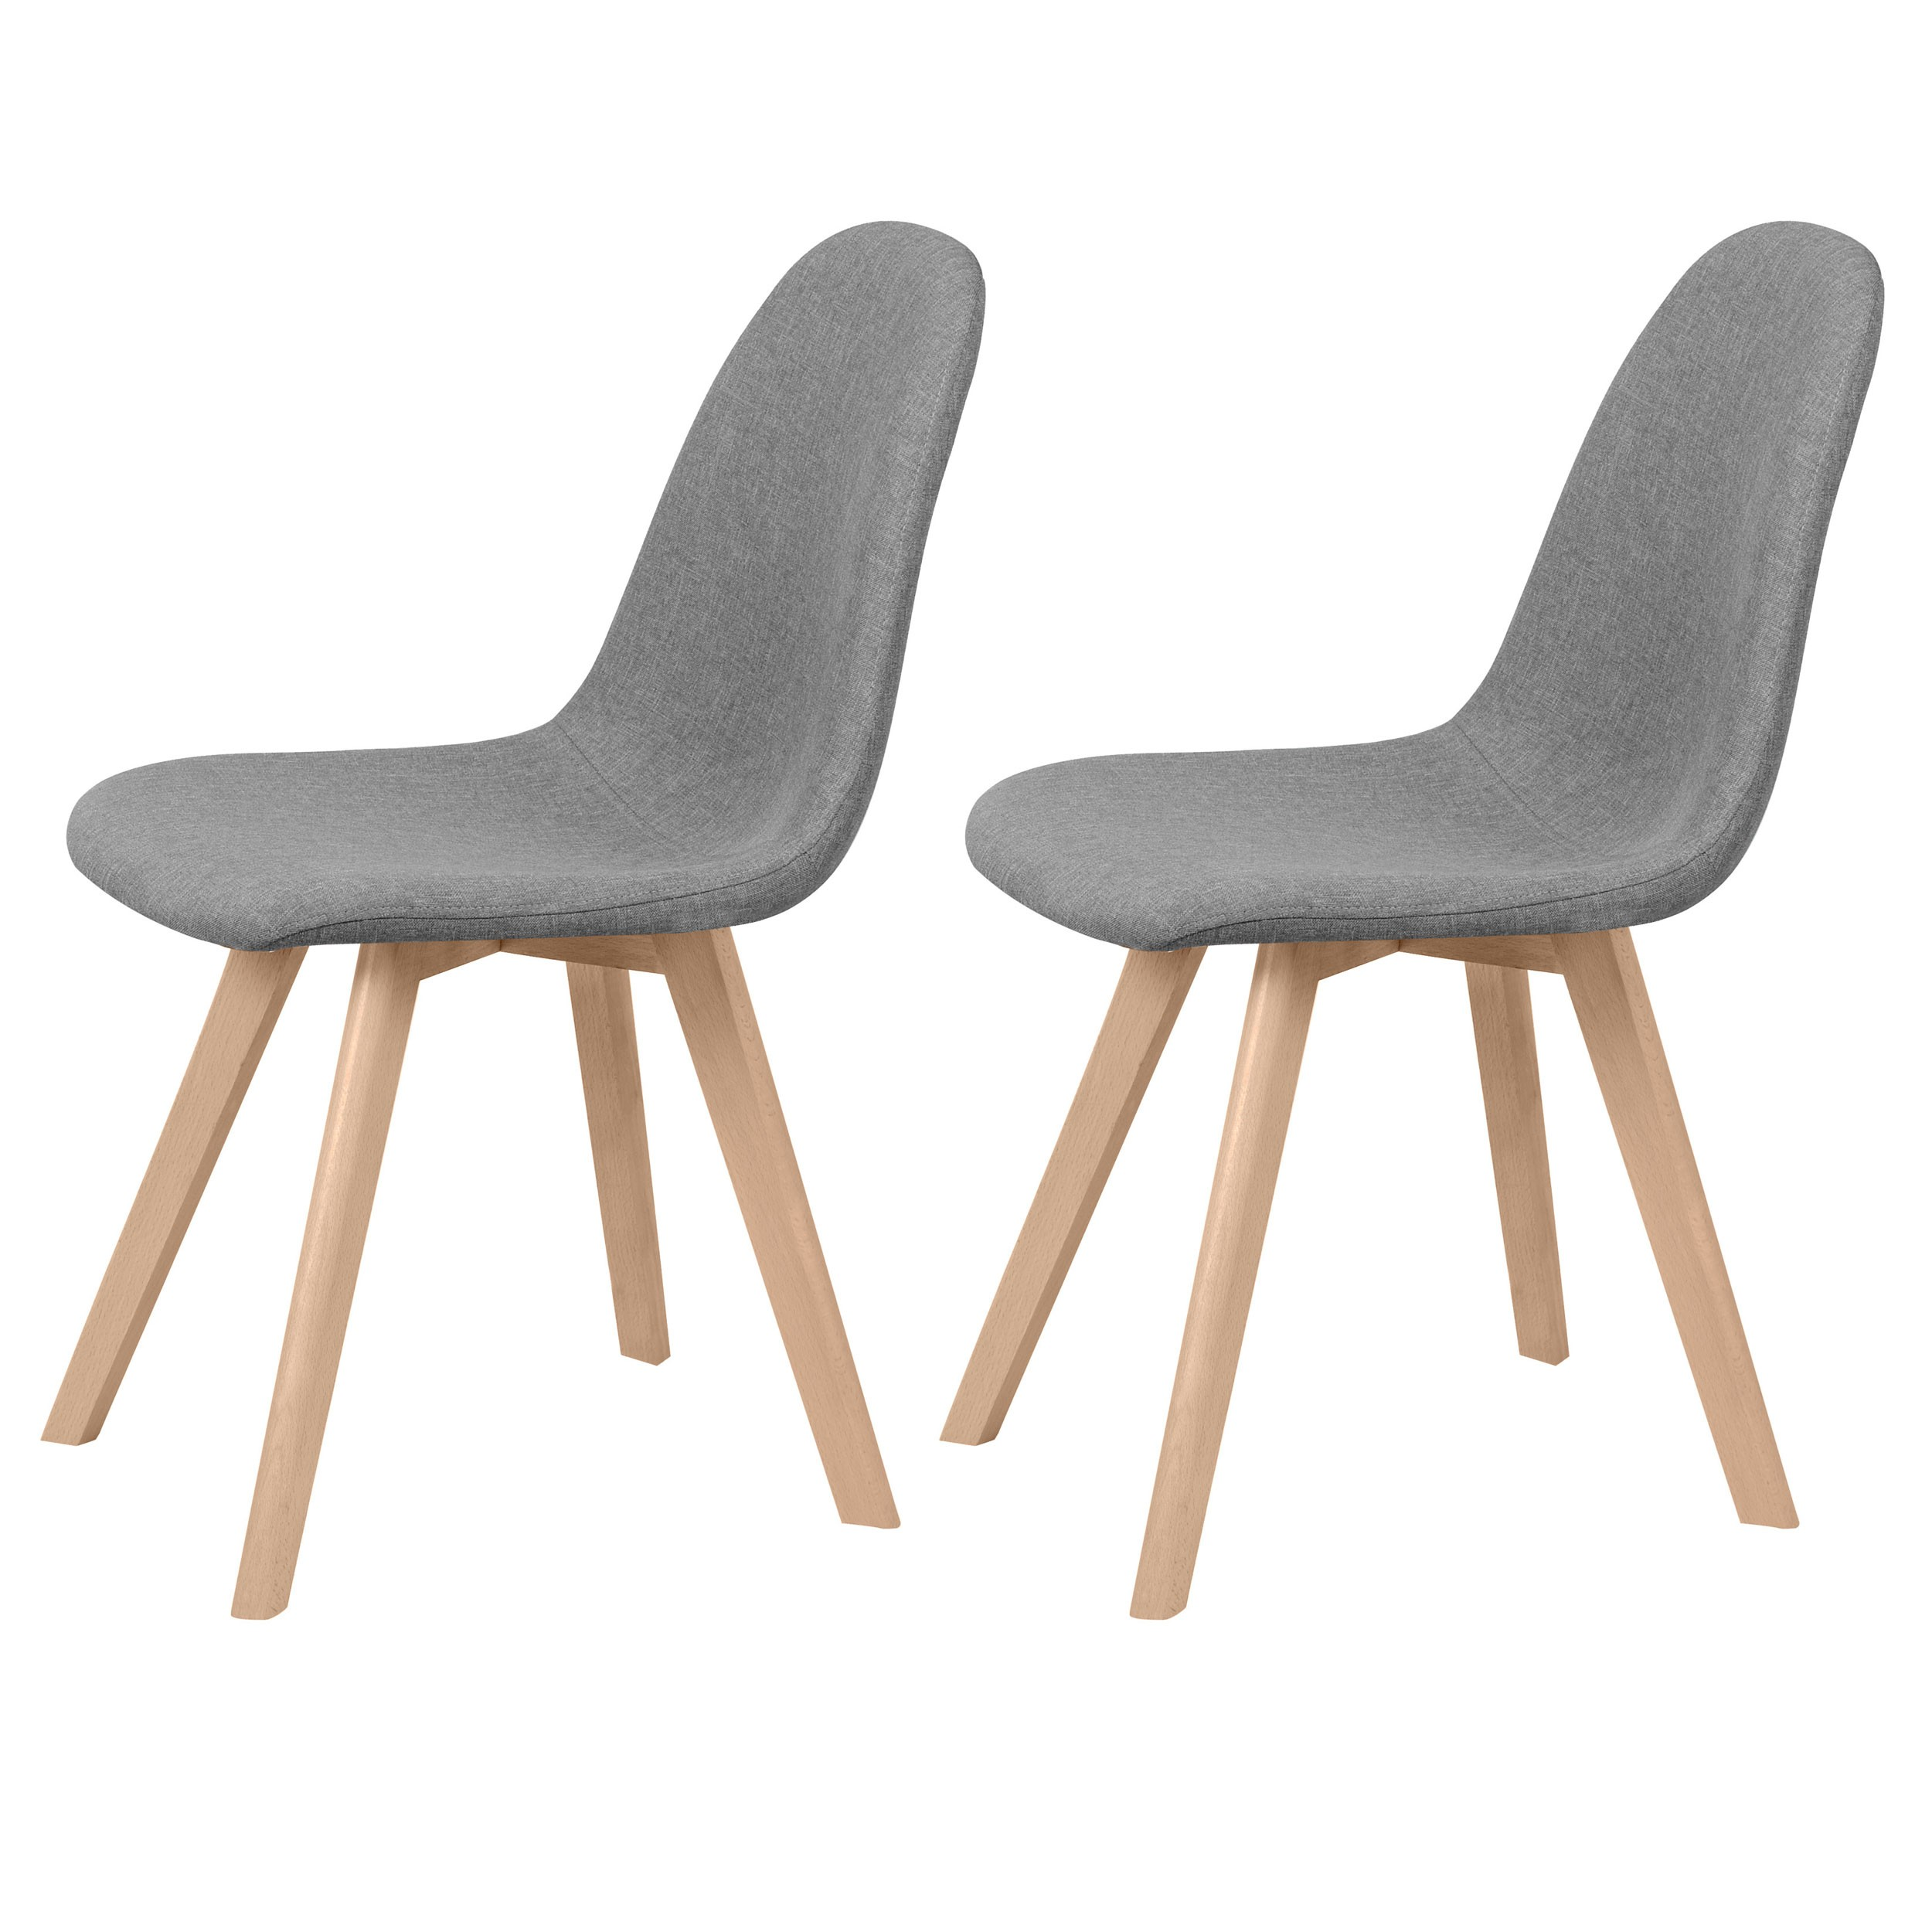 chaise scandinave tissu gris clair